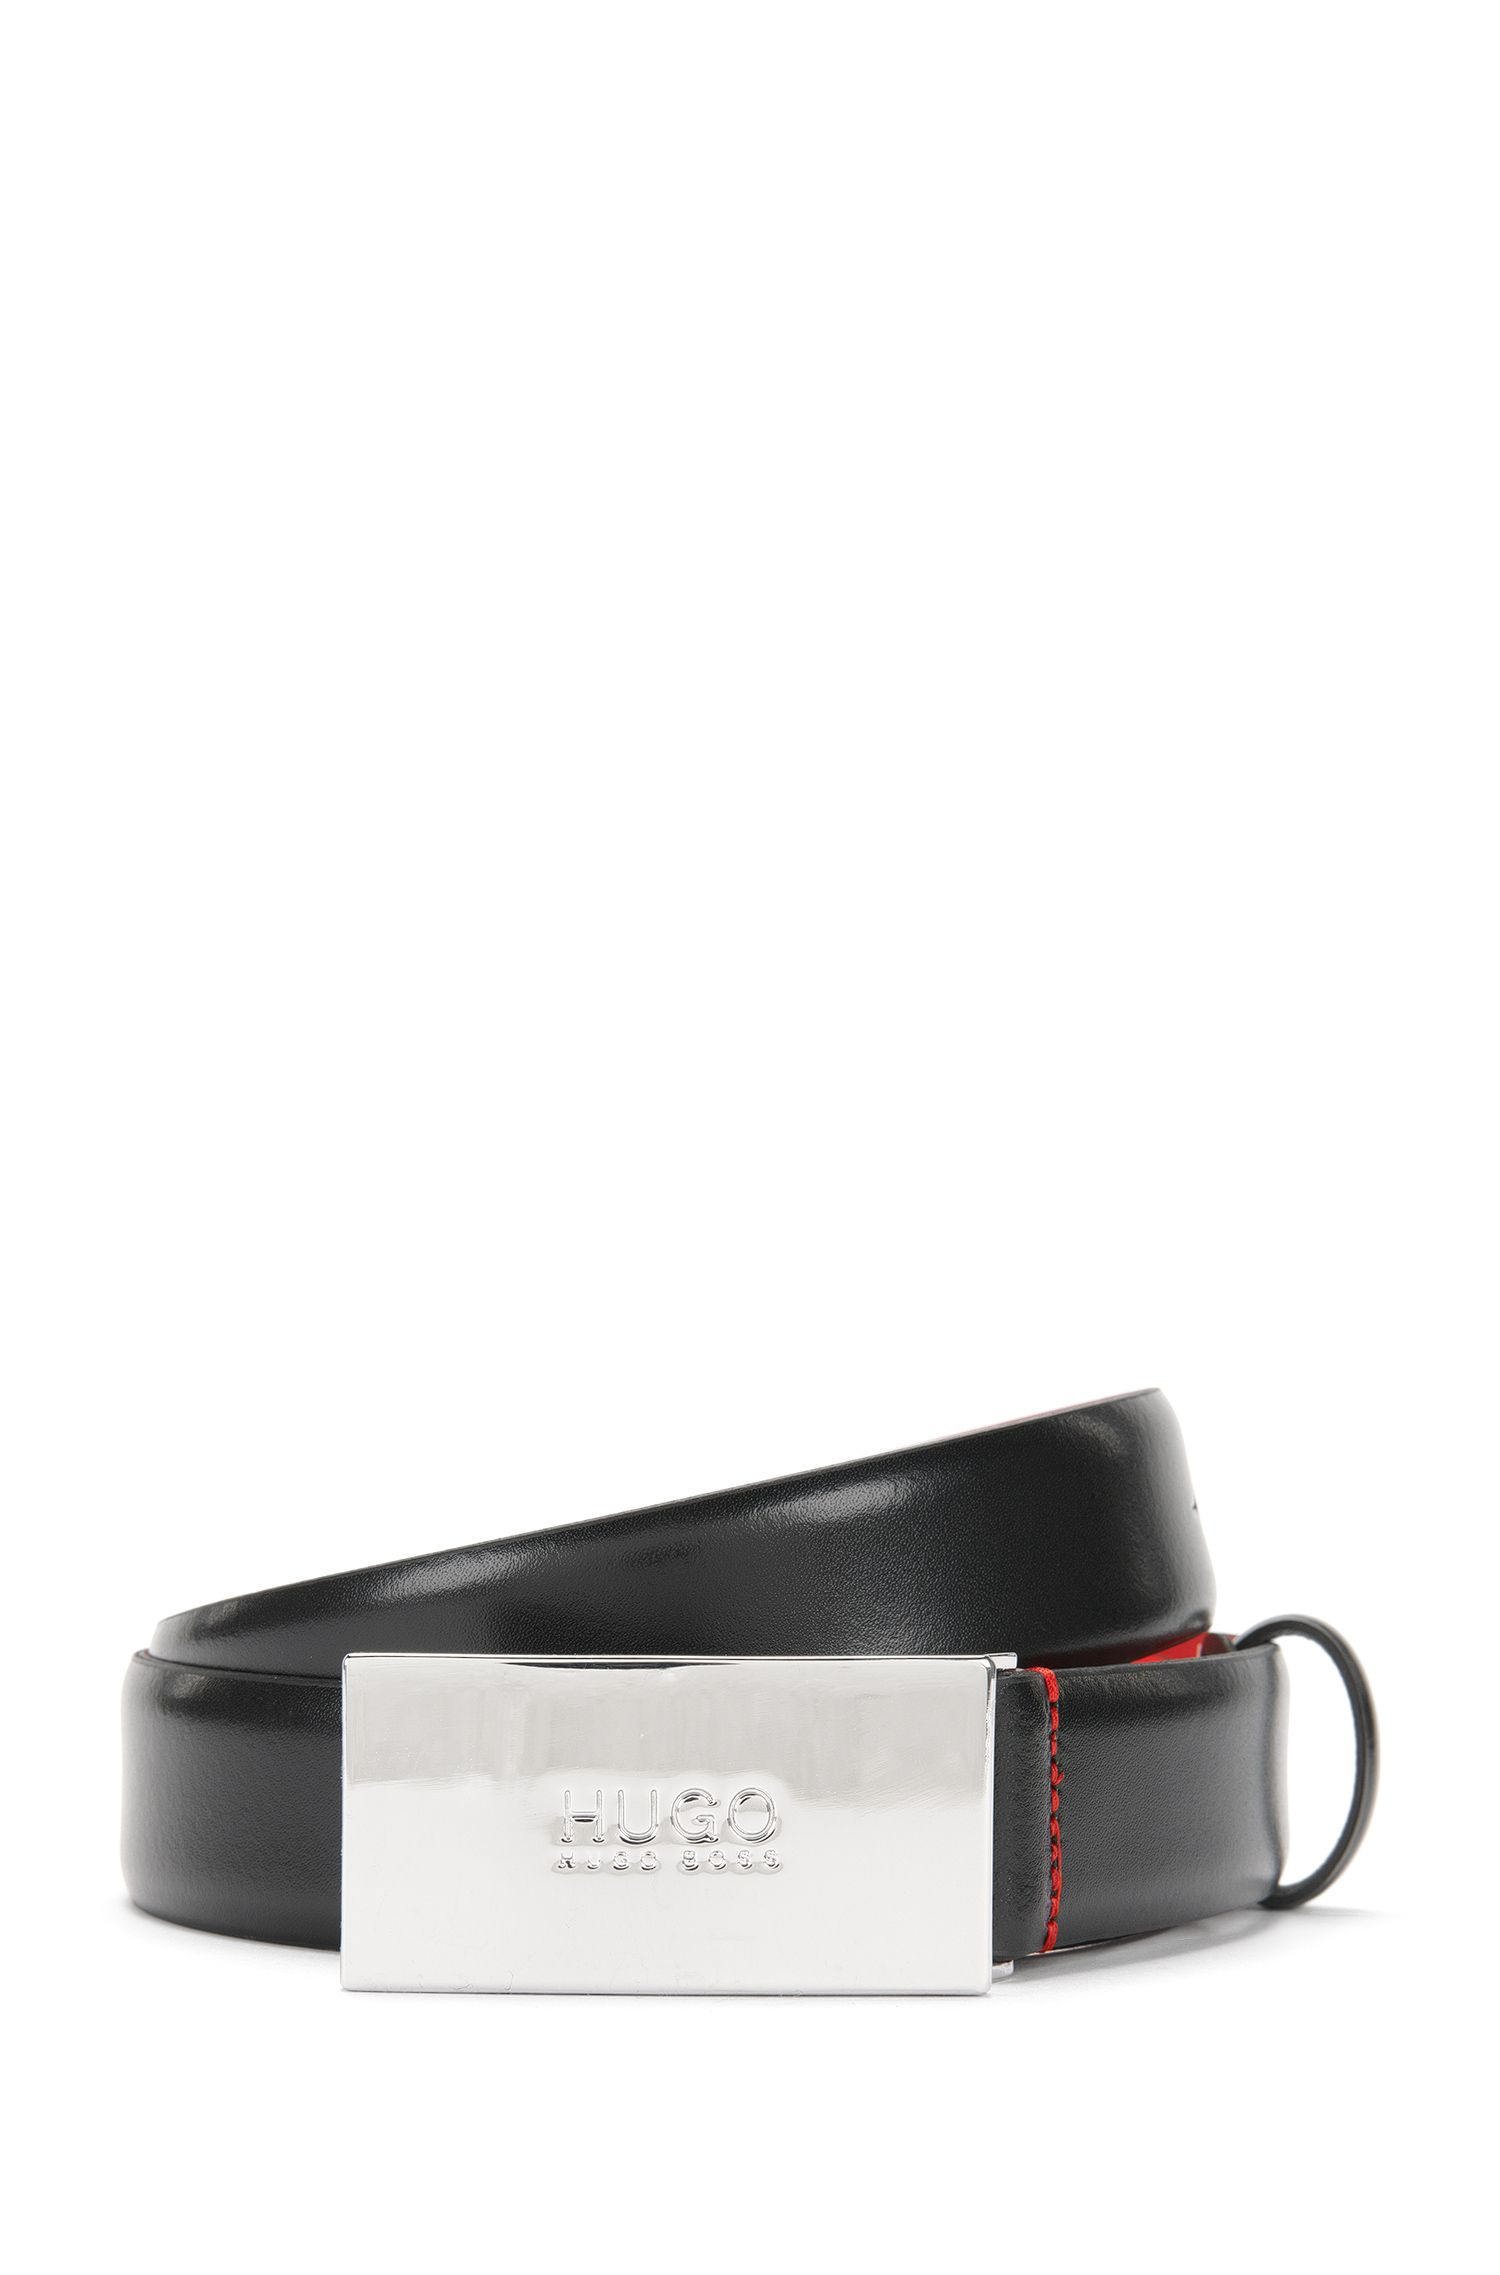 Leather belt with logo-detail plaque buckle, Black